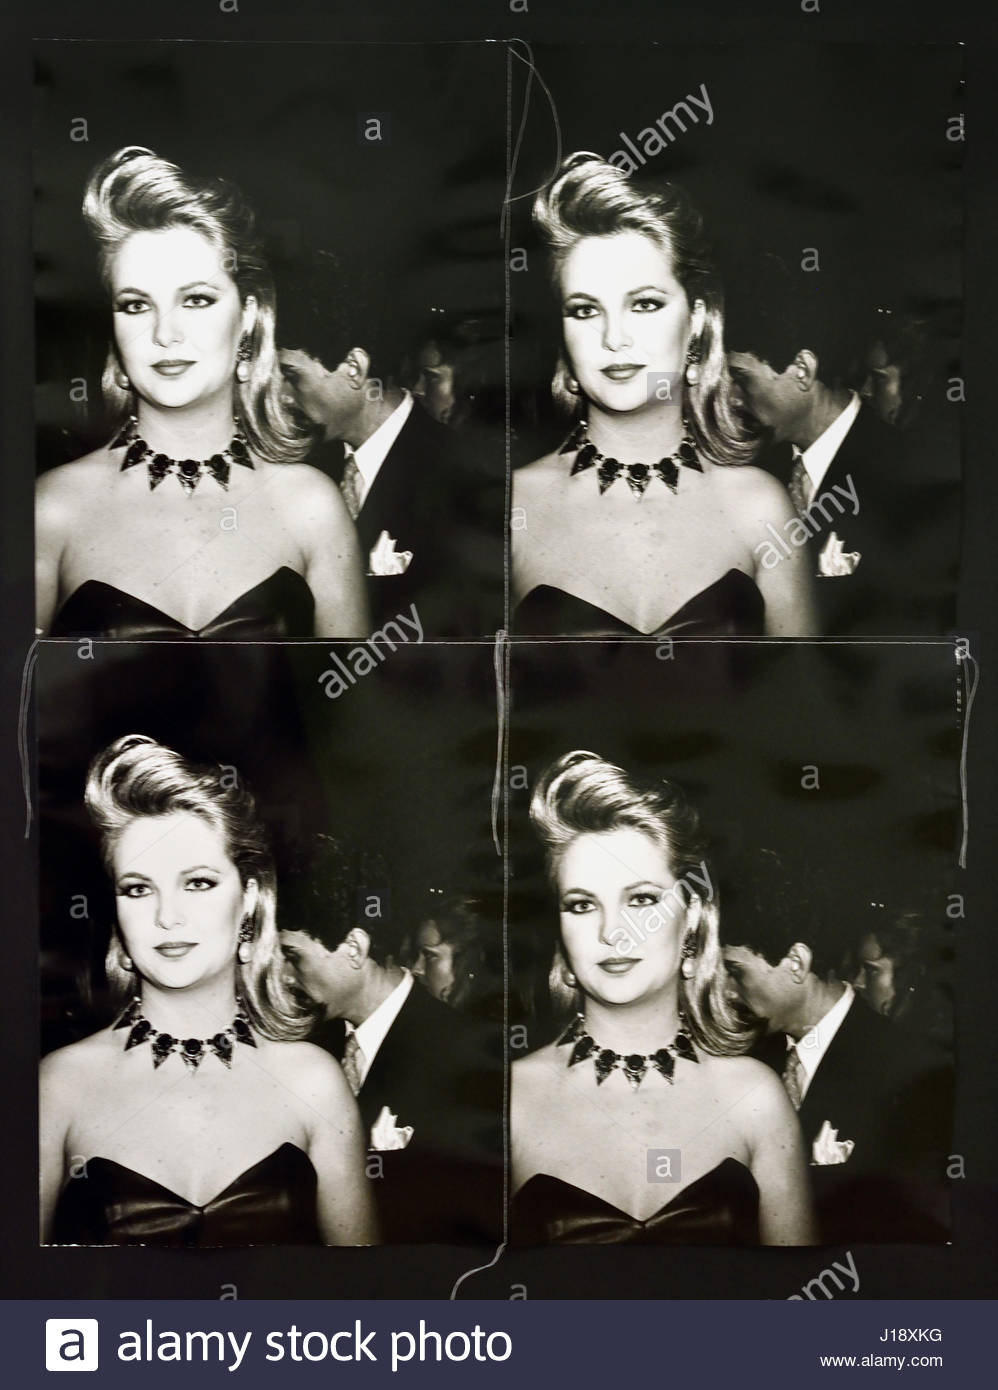 Cornelia Guest 1981 Andy Warhol 1928-1987 American United States of America USA - Stock Image